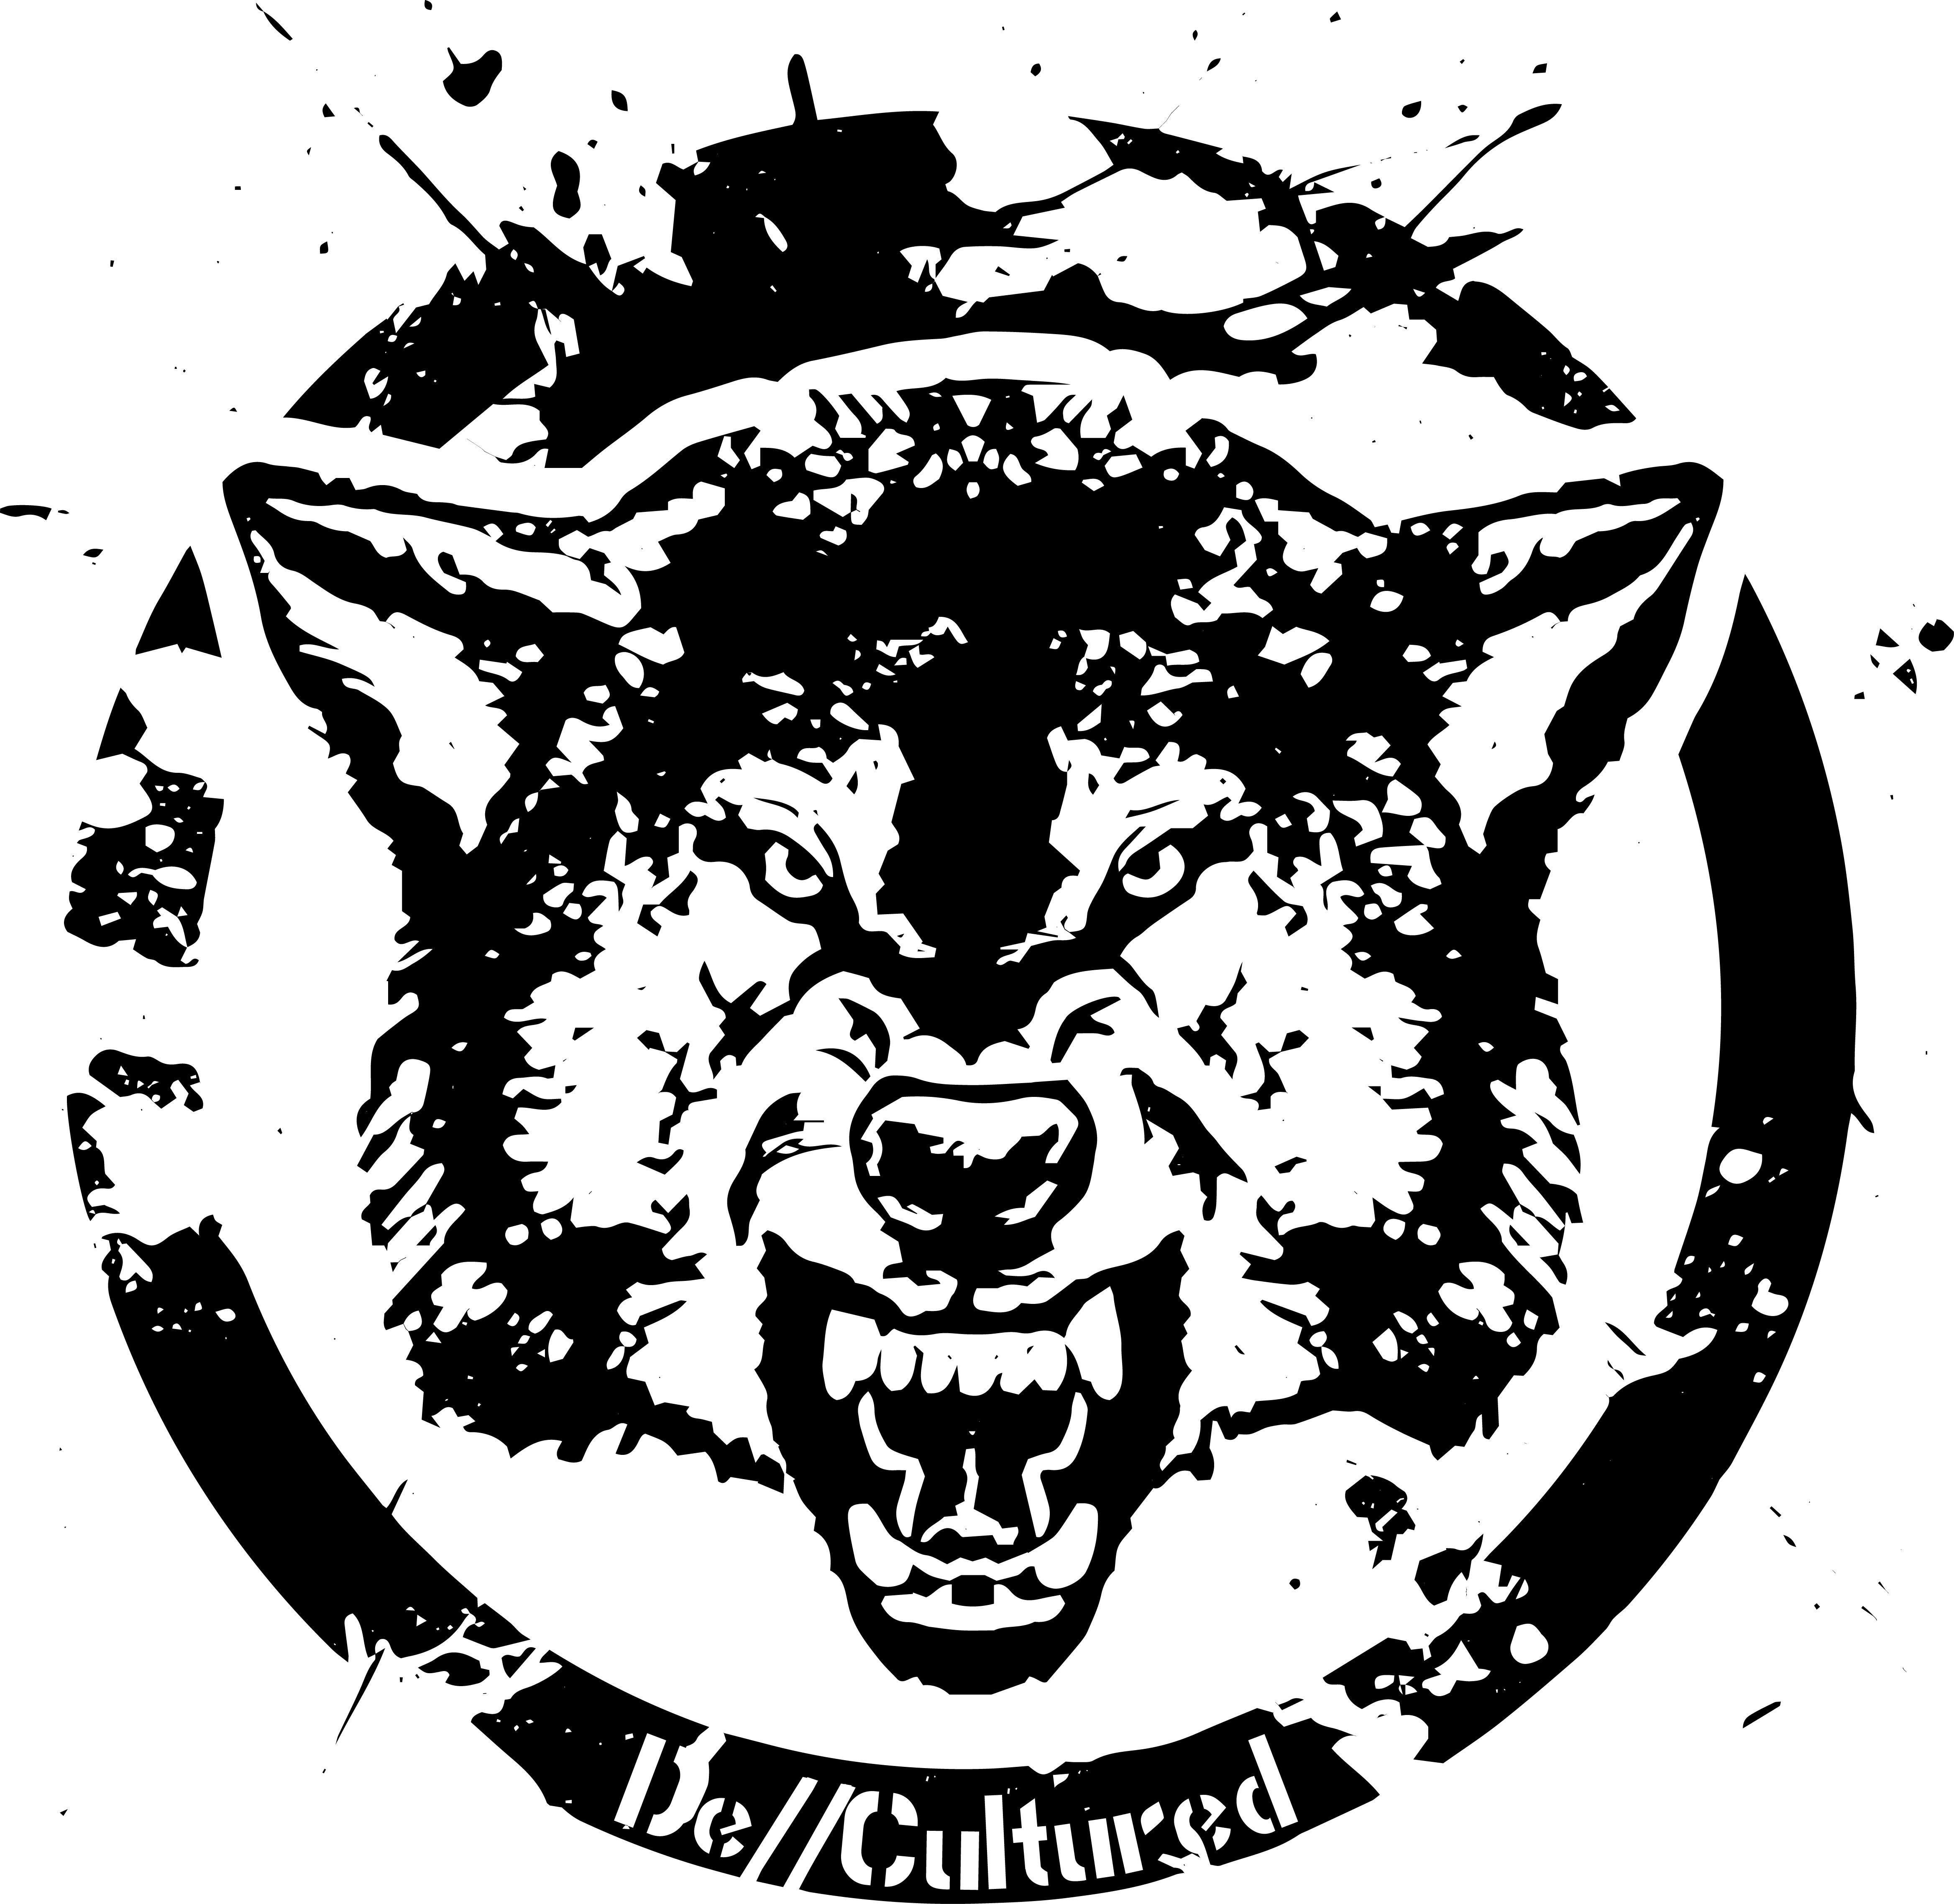 De\\Cultured - Wolf - Urban Design of a Wolf using Stencil Graffiti Style Artwork US Store for Wolf Design : http://decultured.spreadshirt.com/de-cultured-wolf-I1000229160 Facebook Page : https://www.facebook.com/Decultured Twitter Page : https://twitter.com/DeCultured_Co